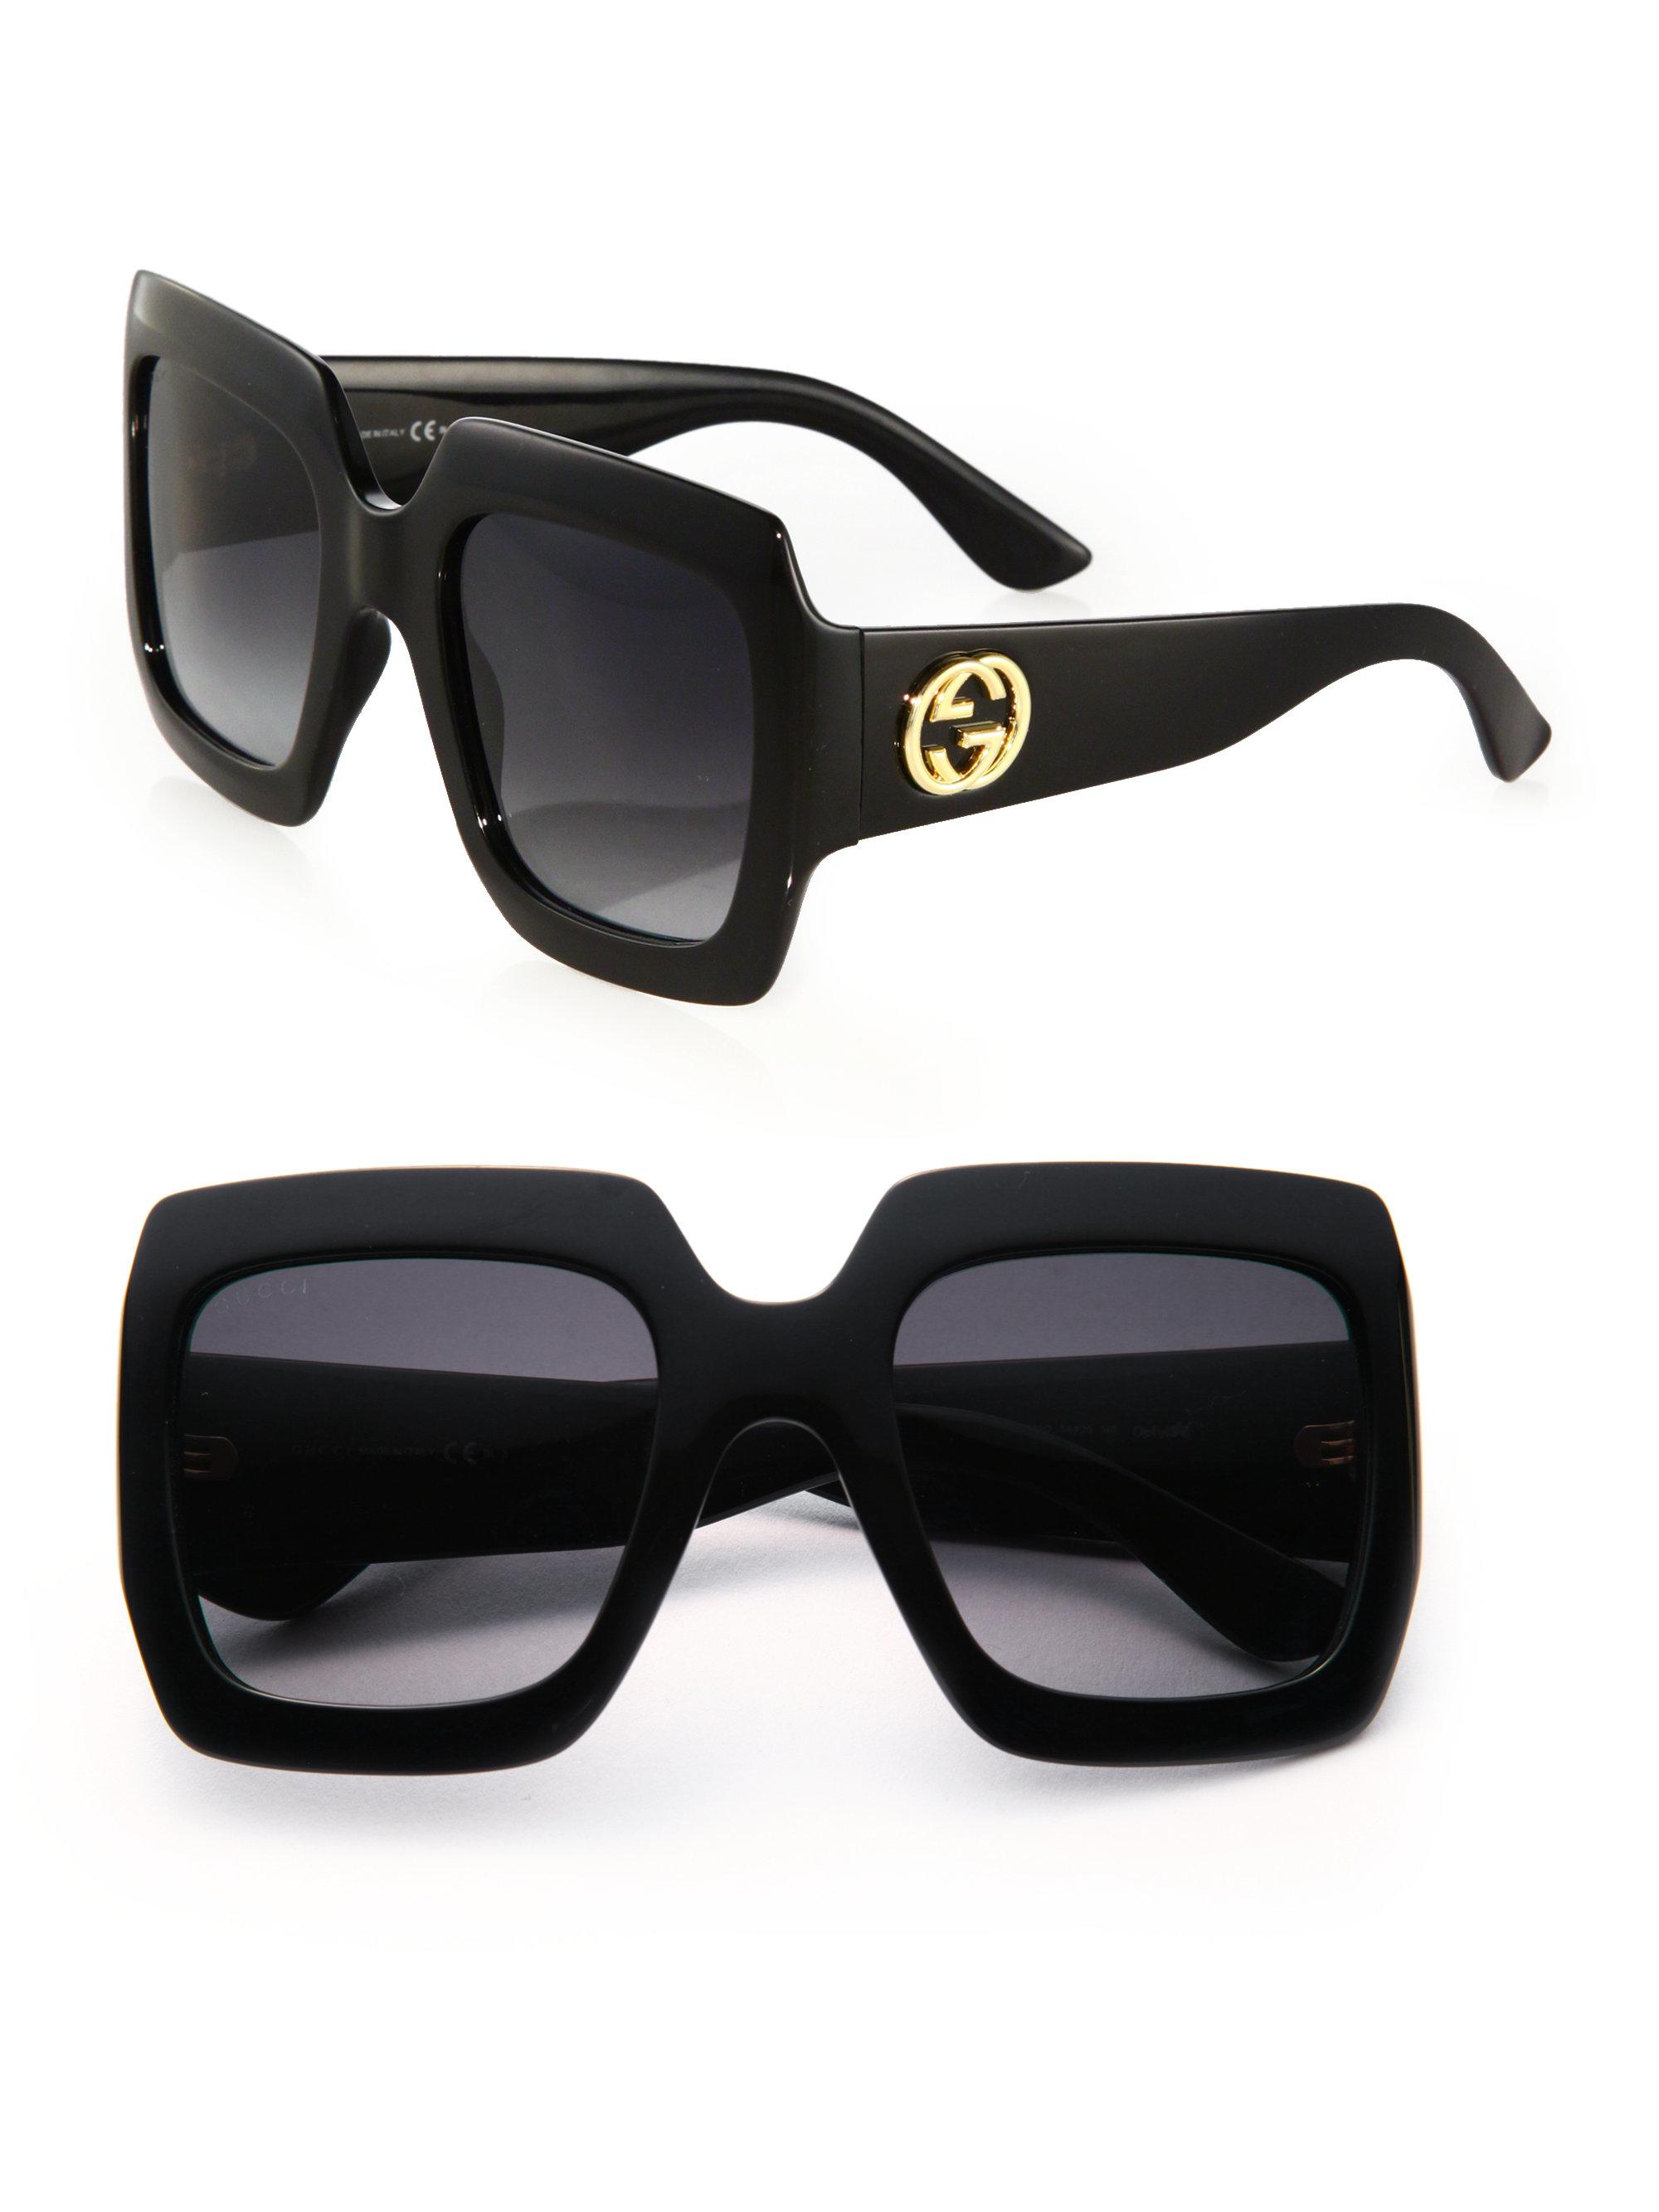 03715f5352 Gucci 54mm Oversized Square Sunglasses in Black - Lyst